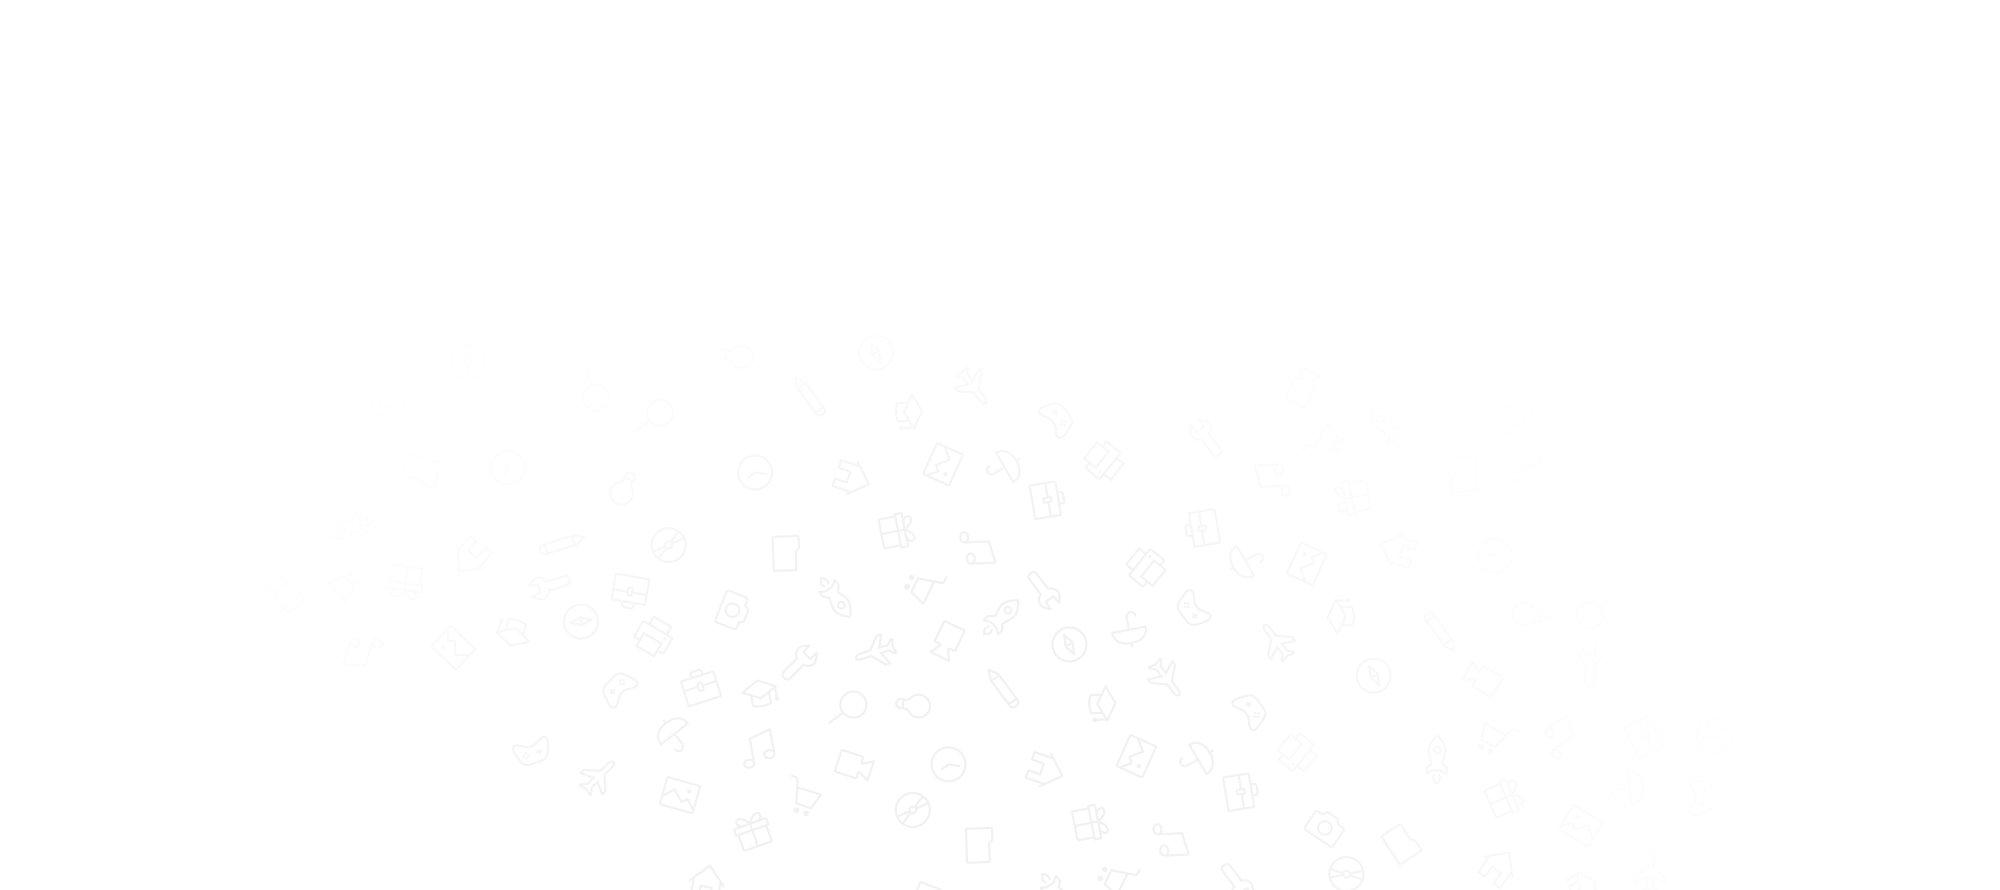 دیدوکتاب